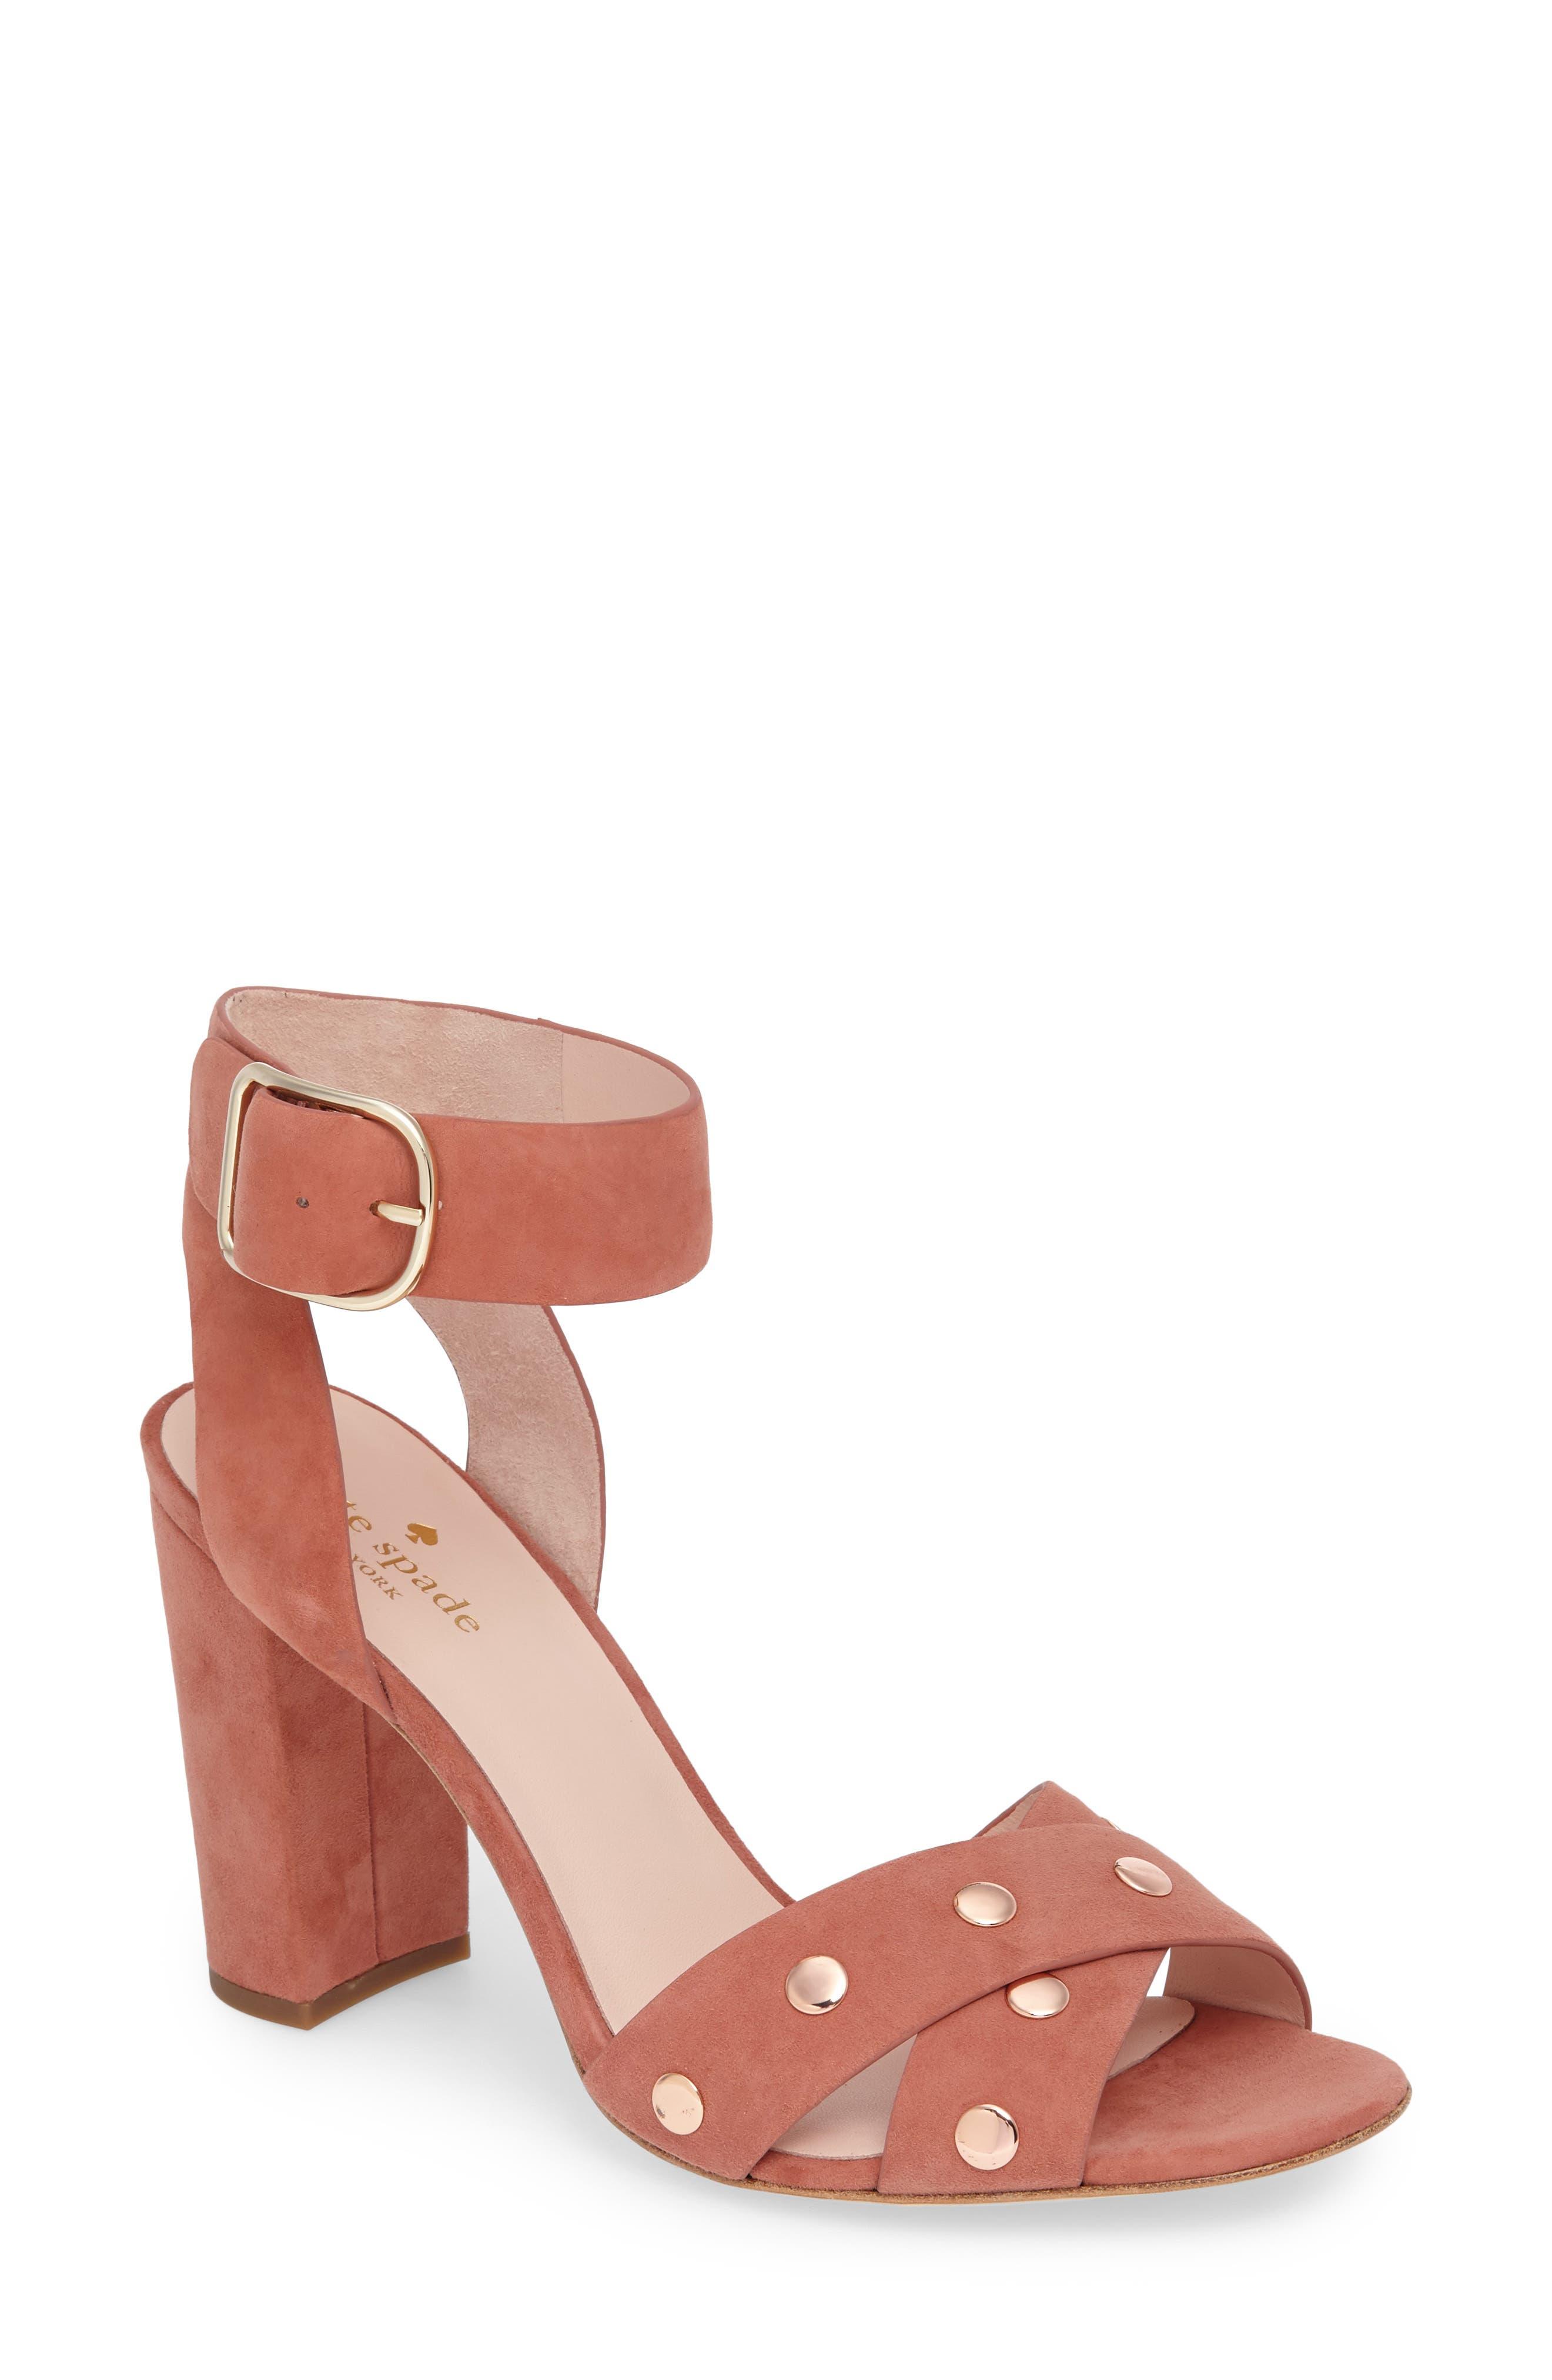 Main Image - kate spade new york oakwood sandal (Women)